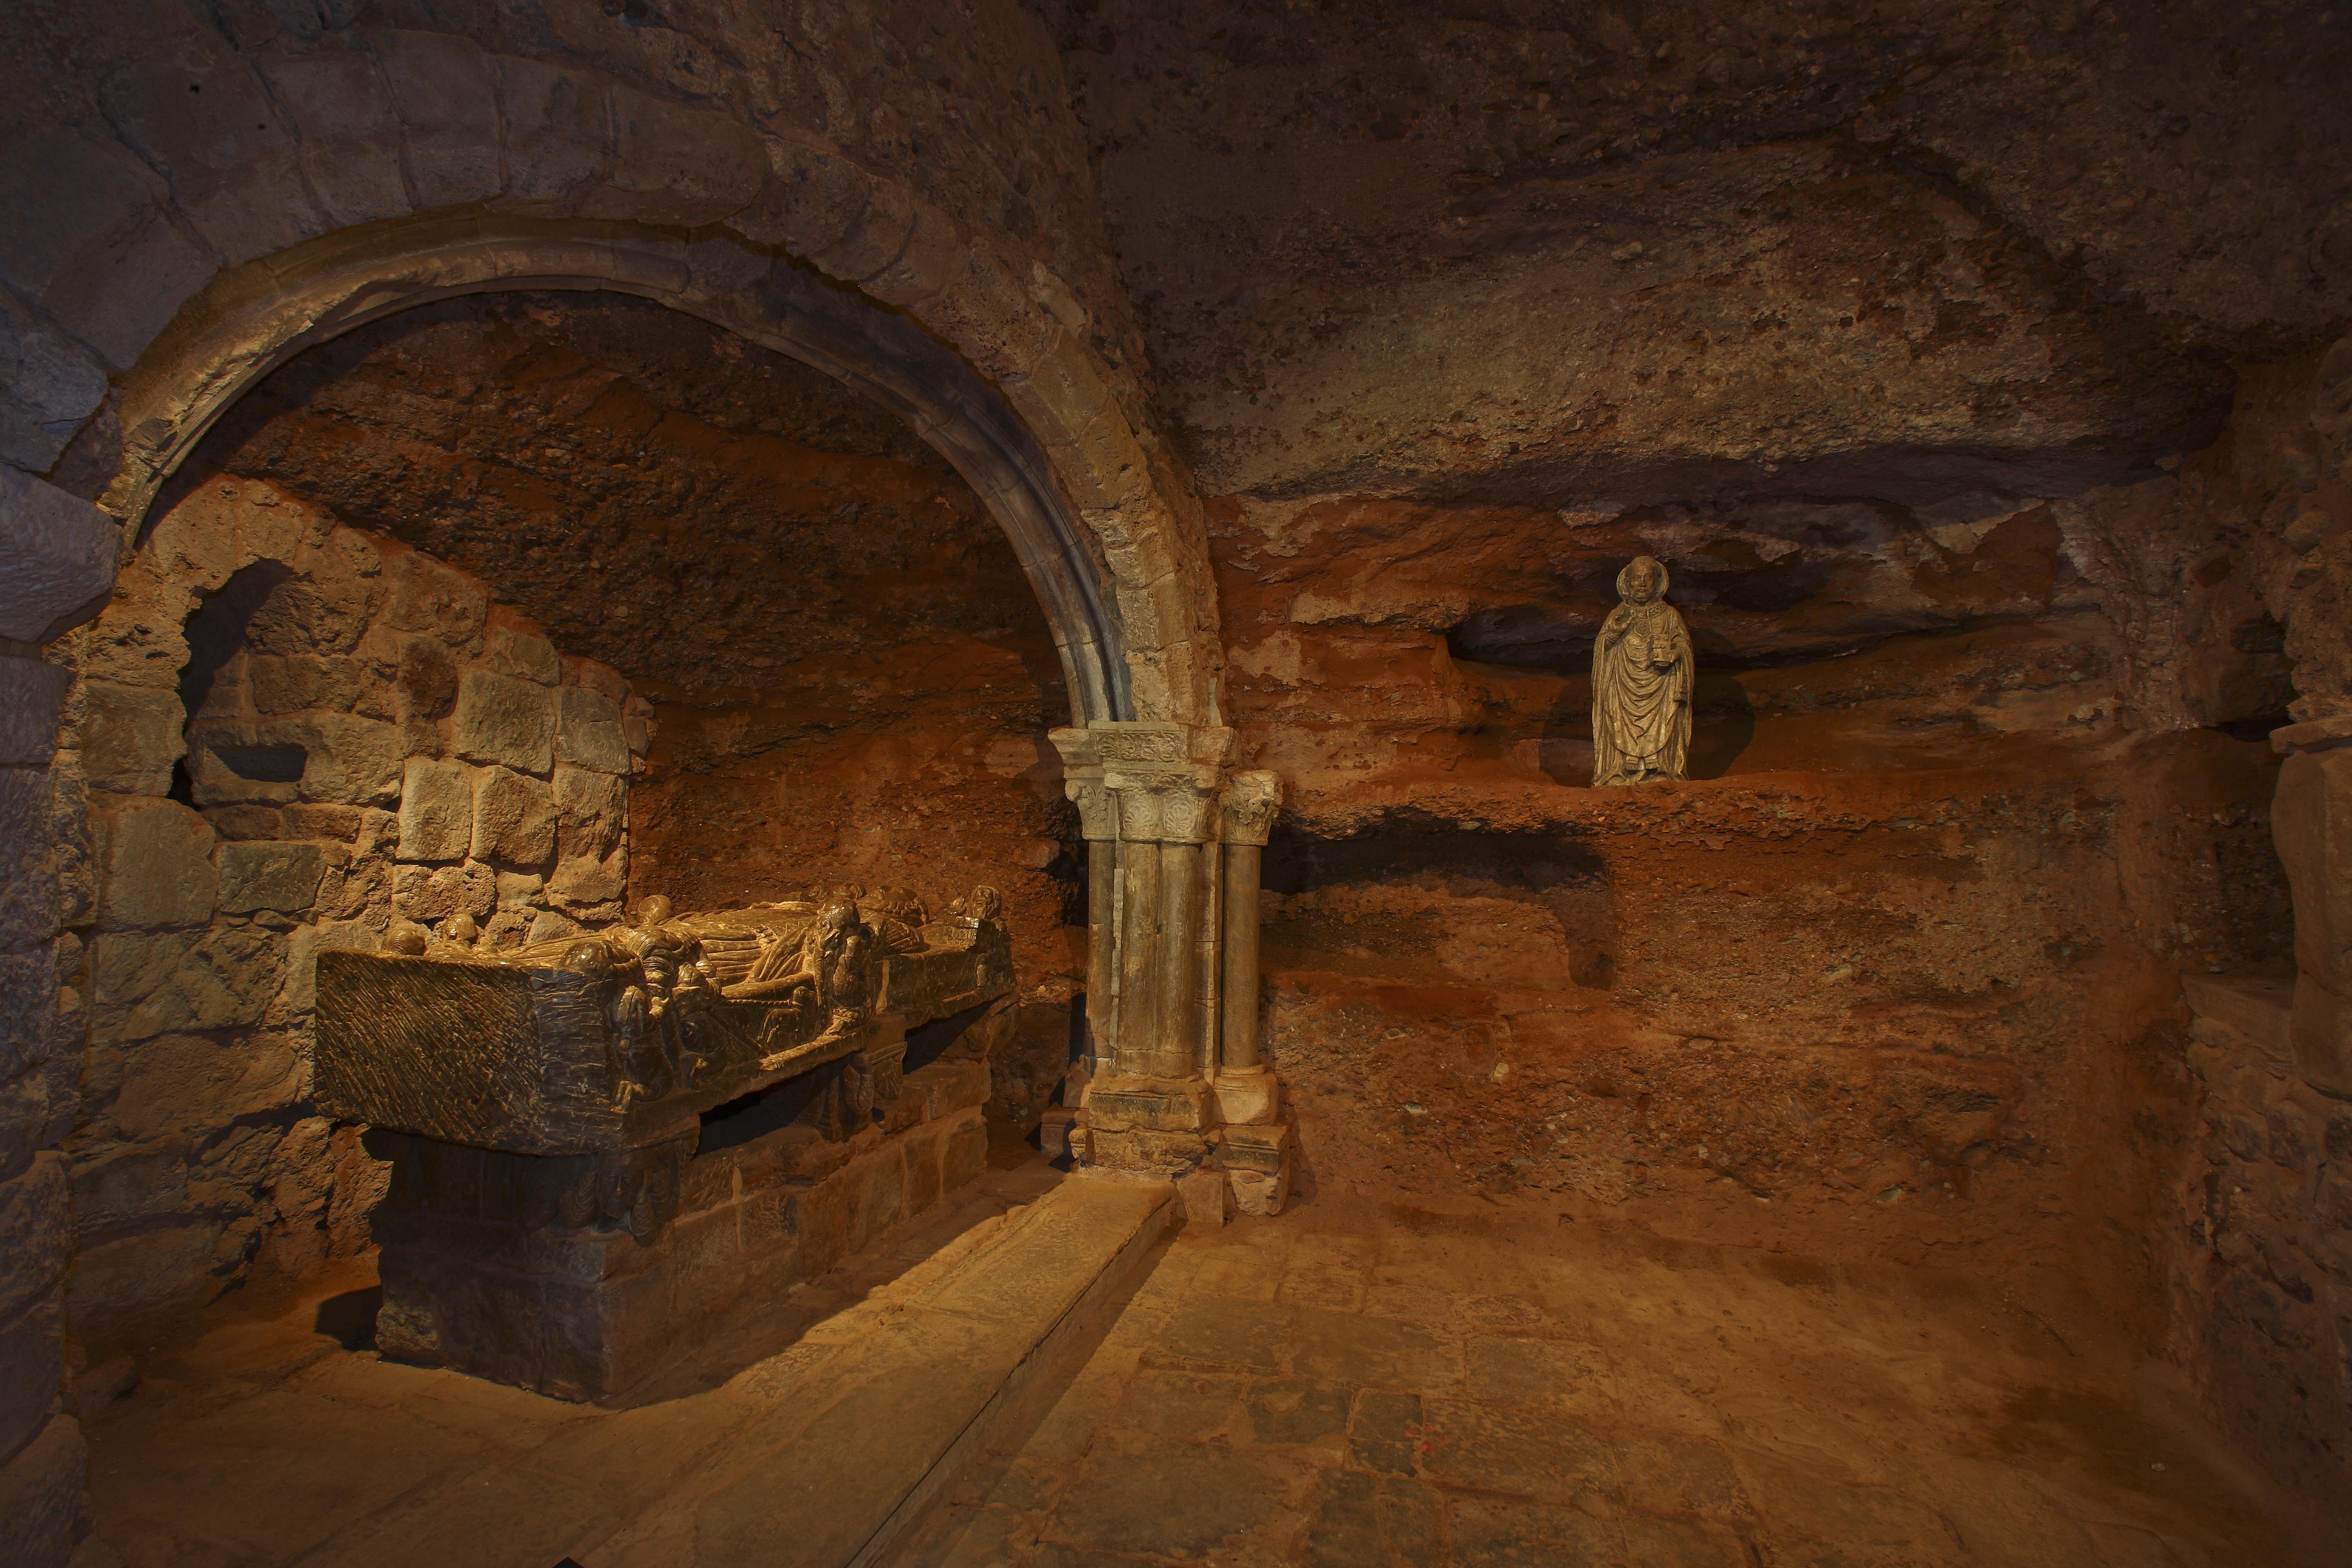 Monasterio de Suso - Lugar de interés - La Rioja Turismo